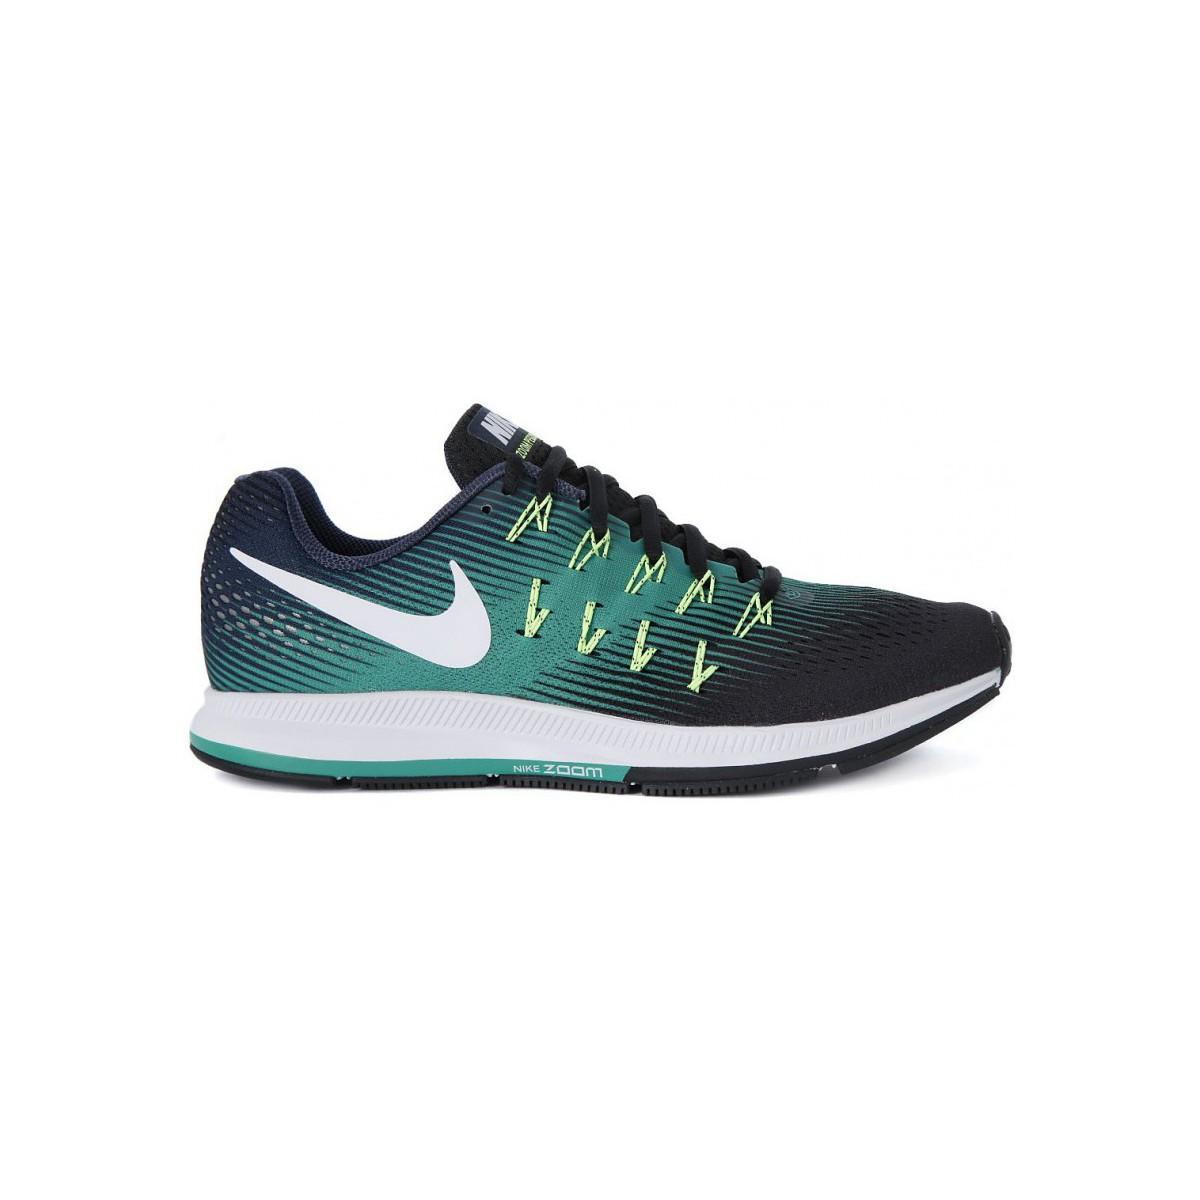 2baac9816ee Nike Zoom Pegasus 33 Men s Running Trainers In Multicolour for Men ...